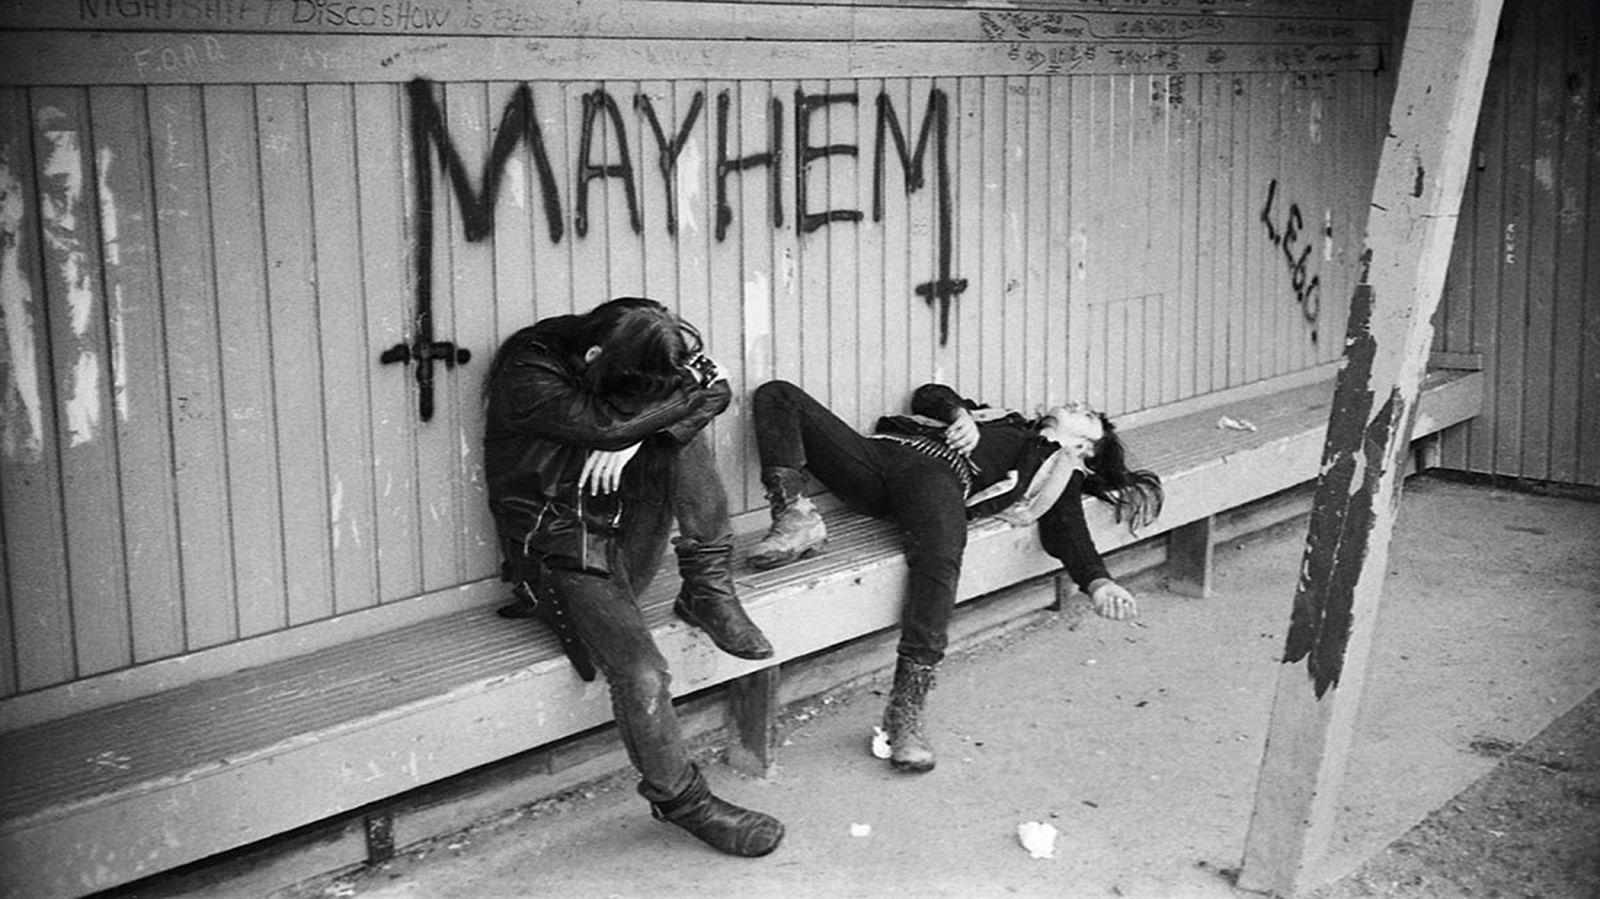 Mayhem | Listen on NTS